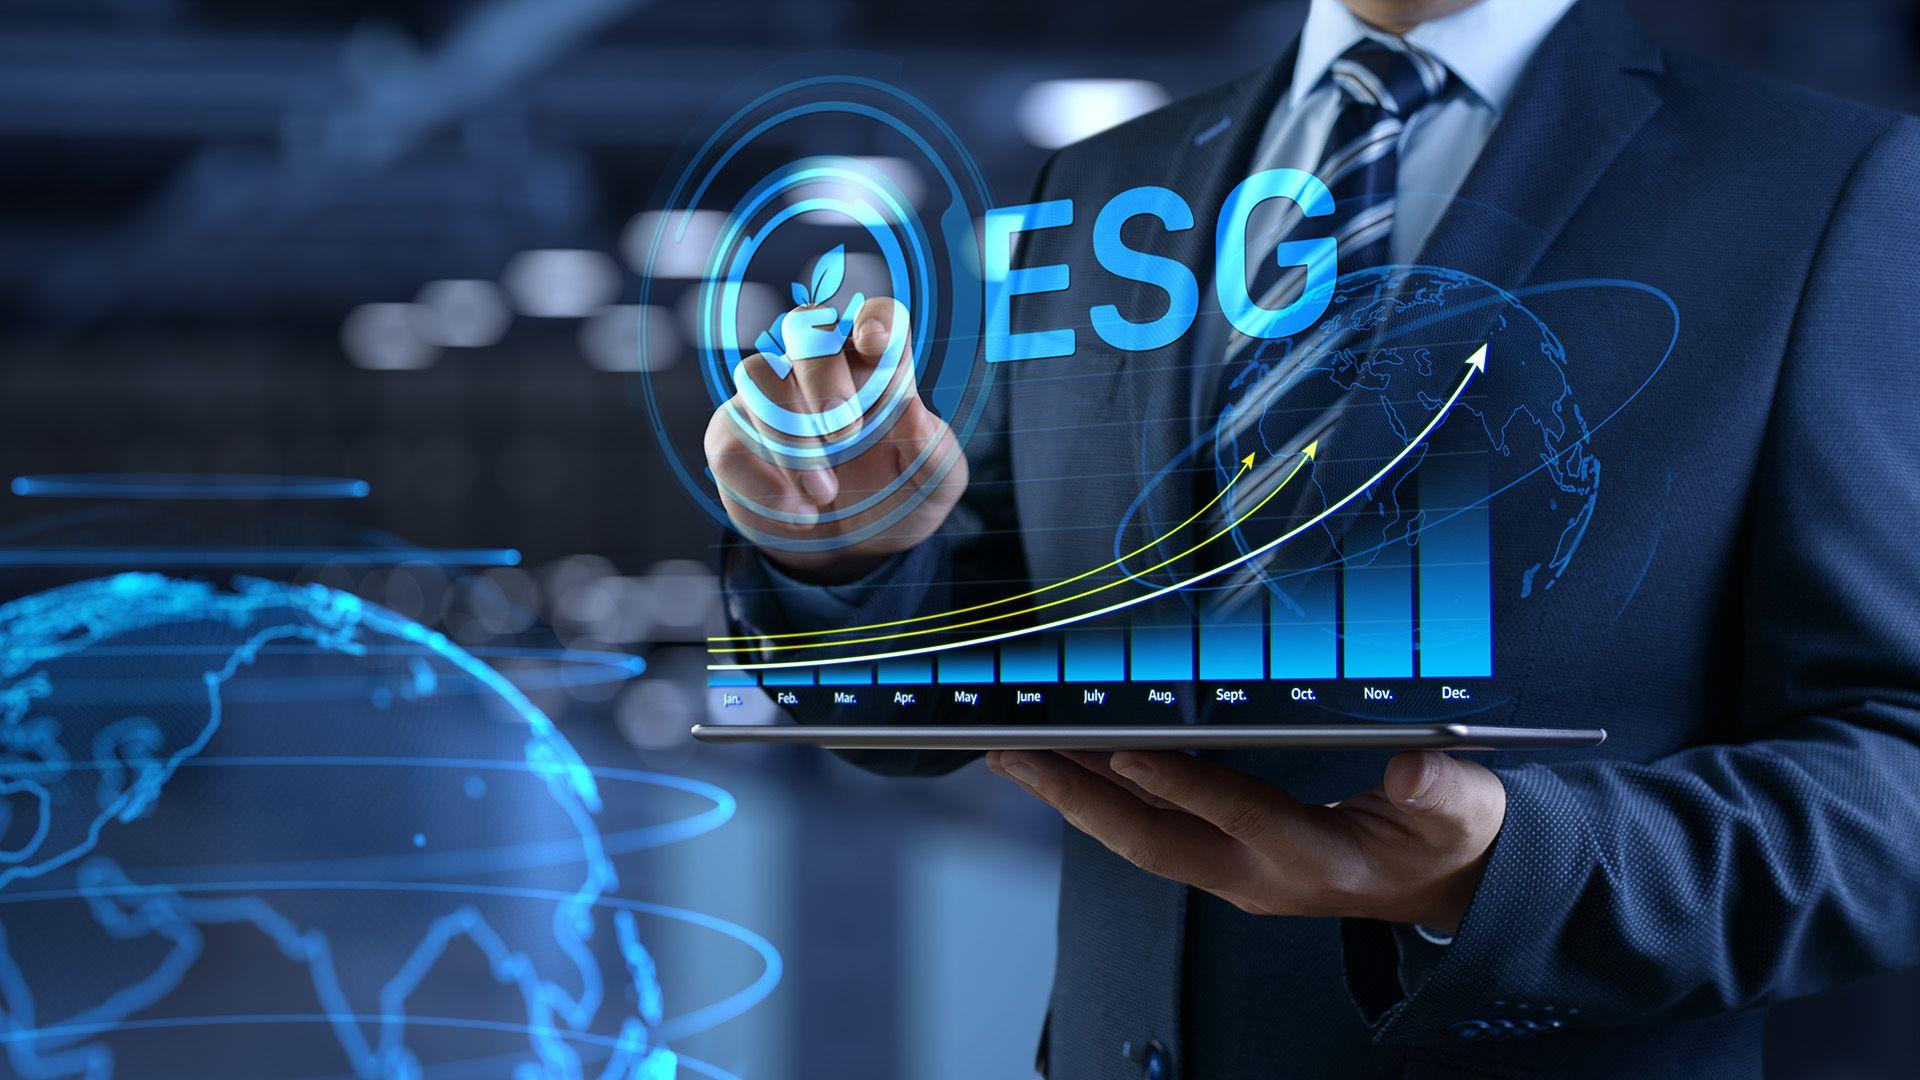 Esg Investing strategy, ESG Data Strategy